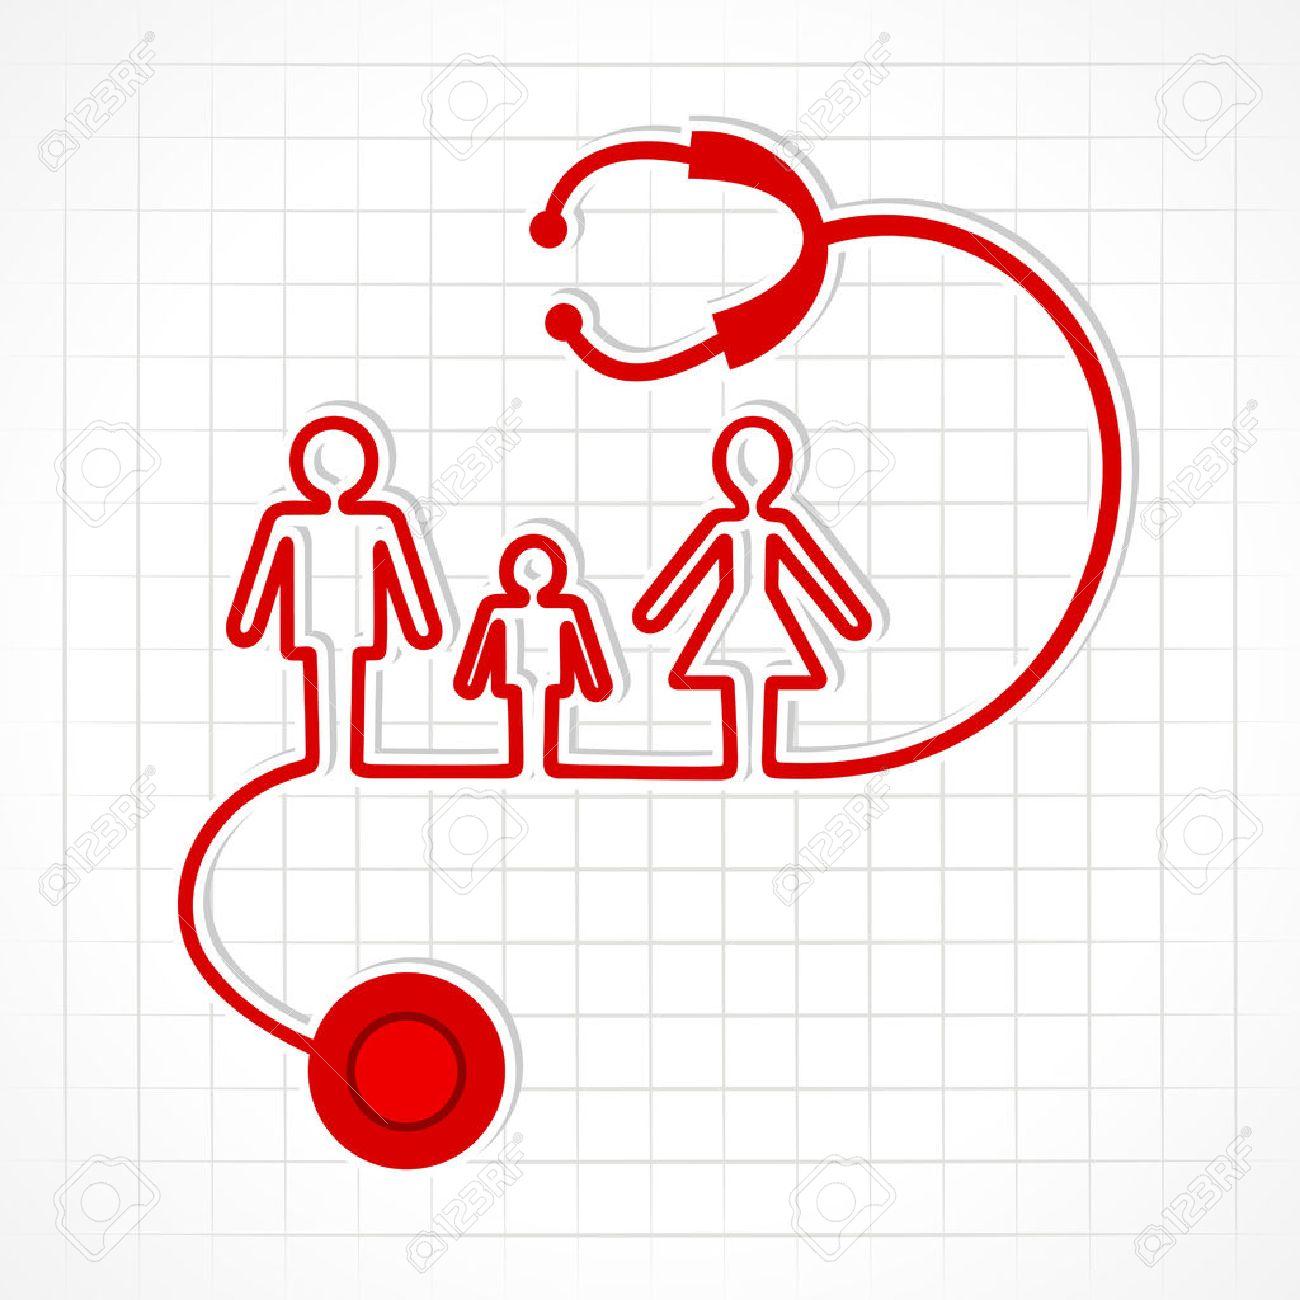 Stethoscope make family icon stock vector - 22713054